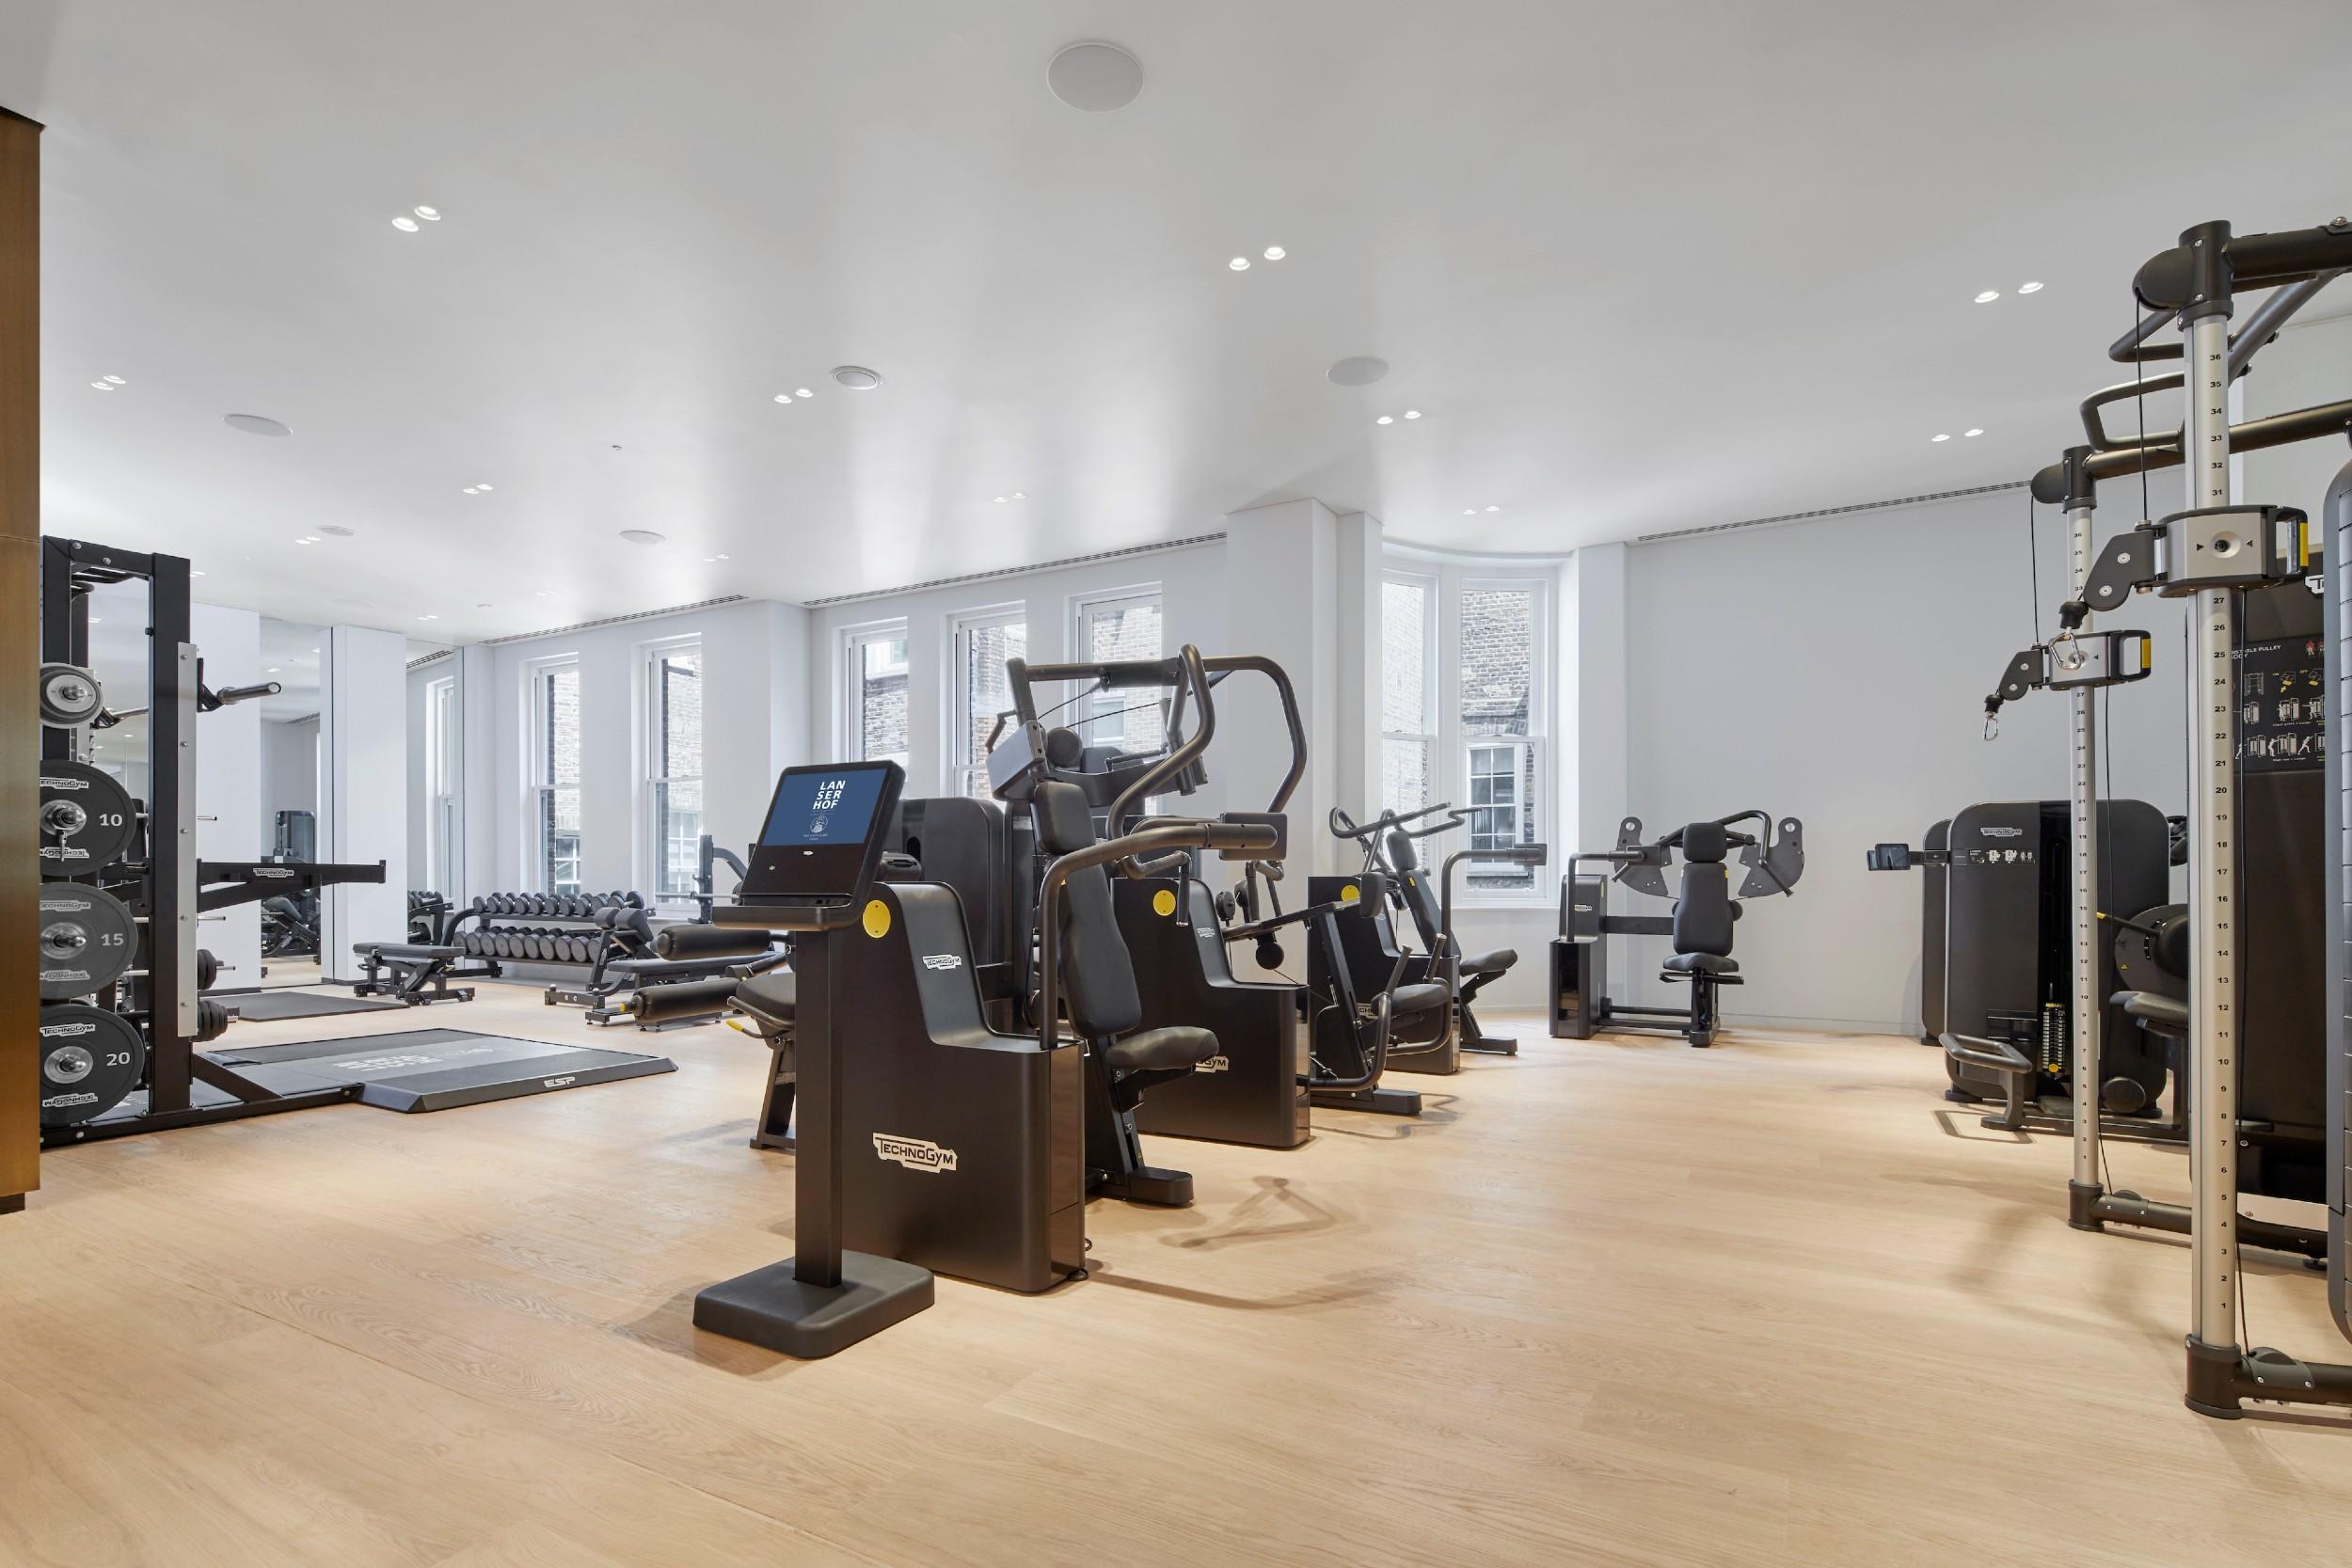 lanserhof_at_the_arts_club_gym_1_1.jpg